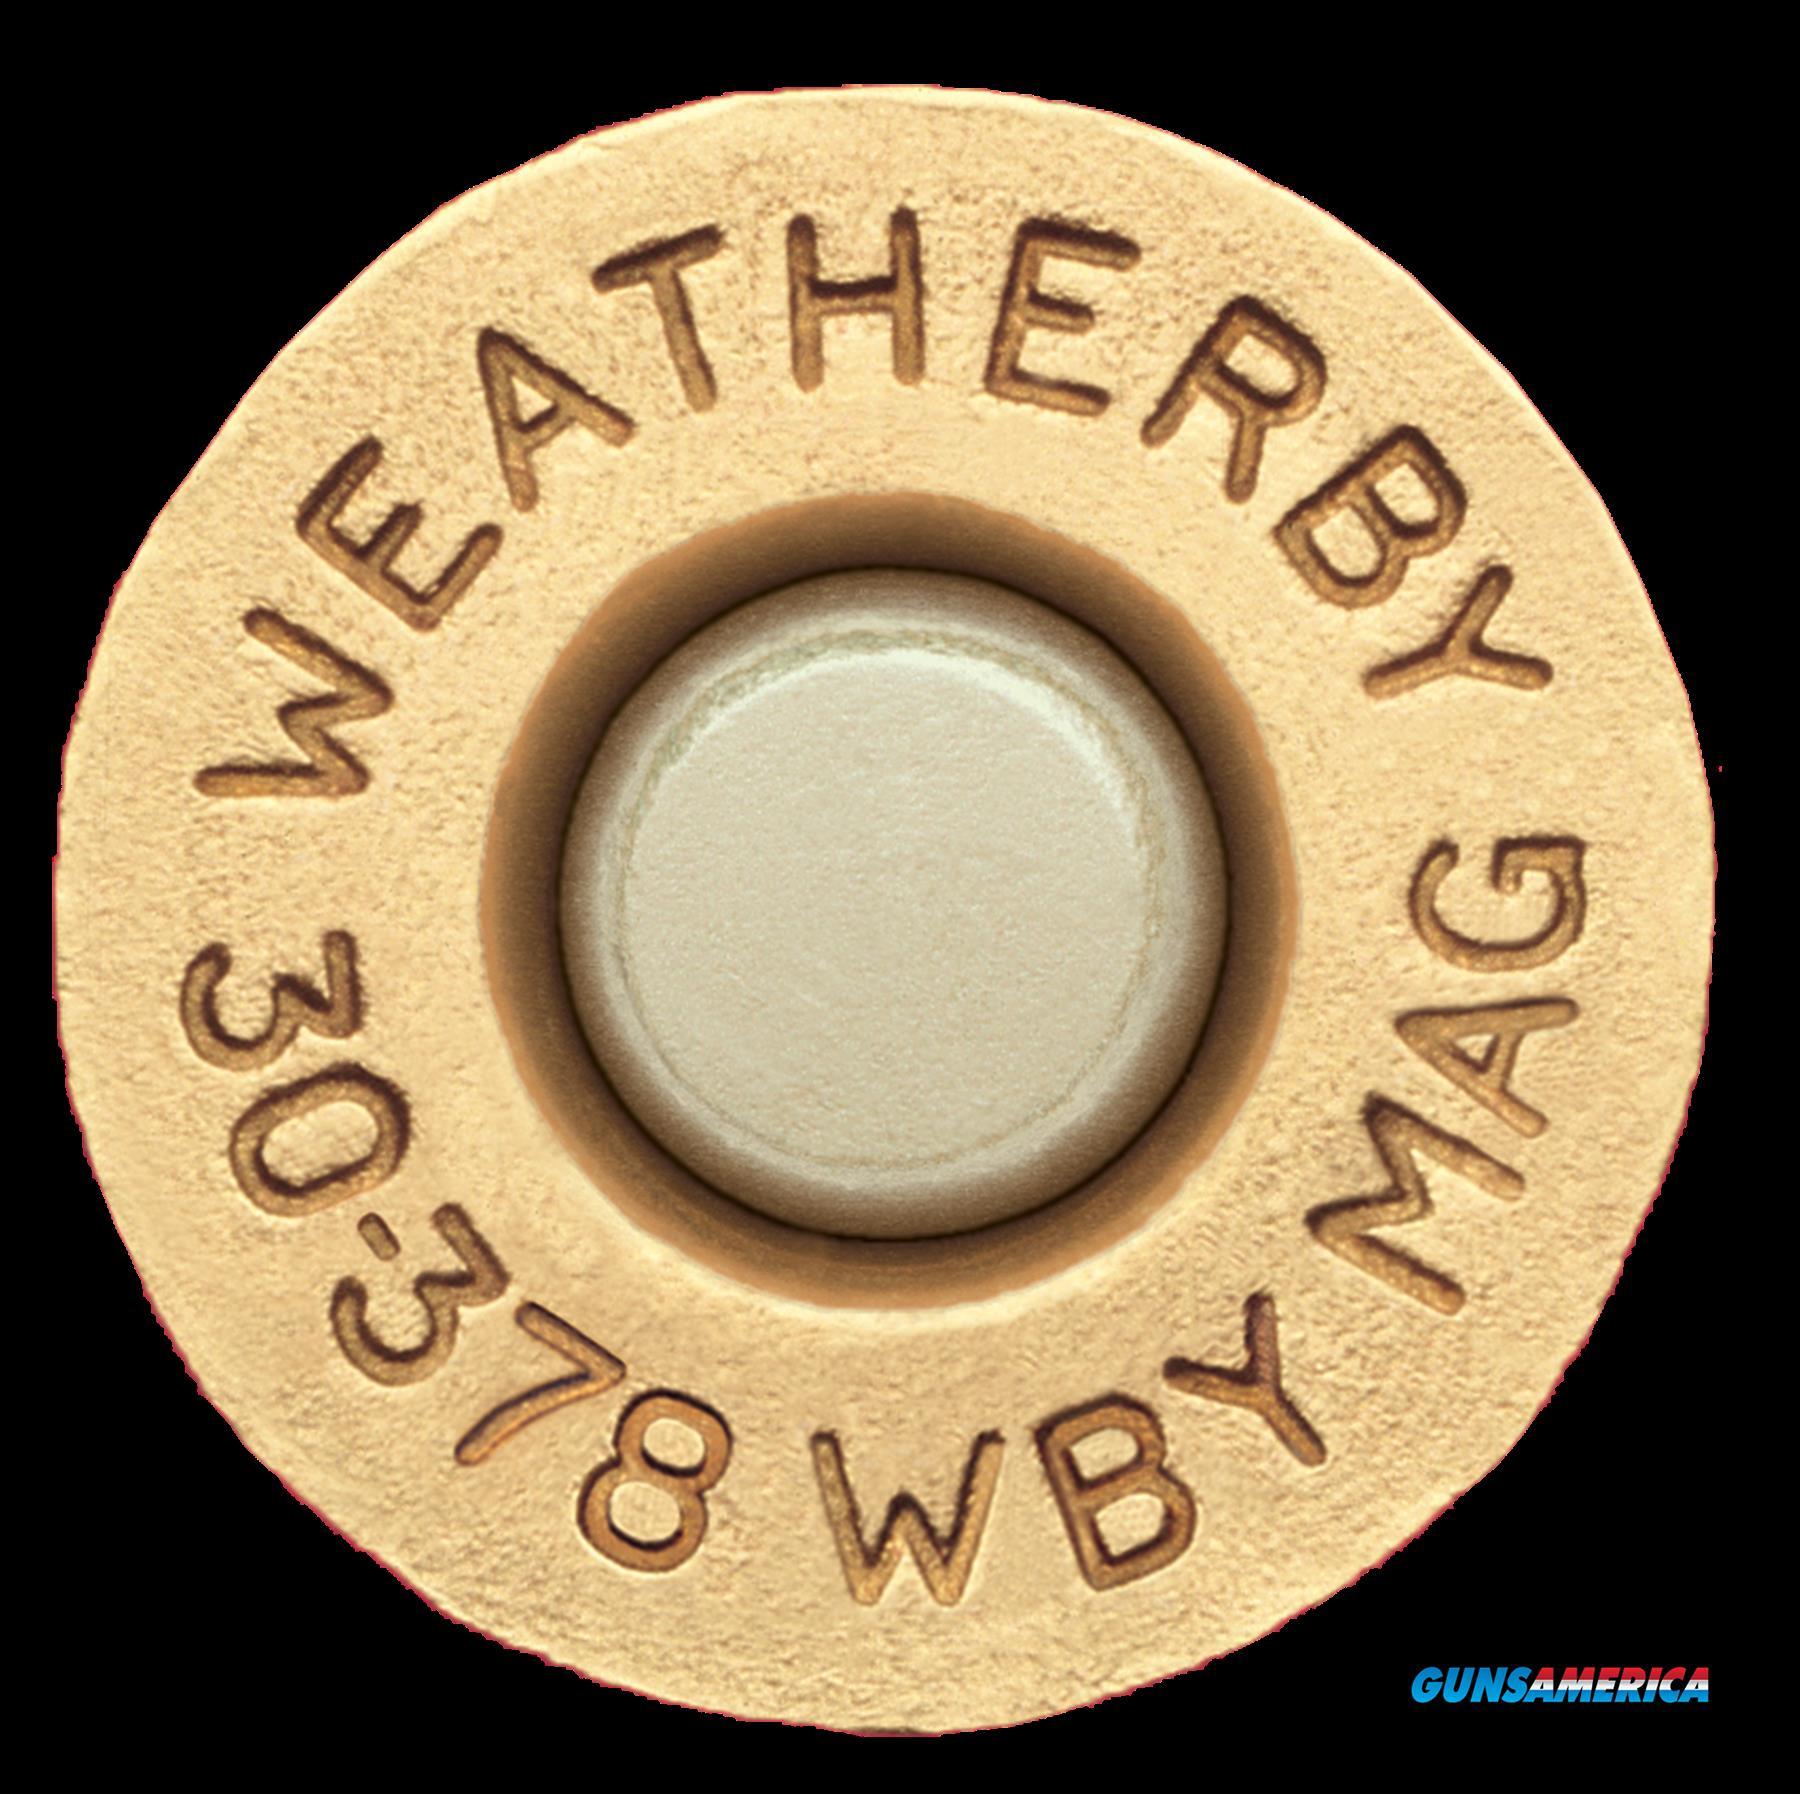 Weatherby Unprimed Brass, Wthby Brass303  Up Brass 30378     20  Guns > Pistols > 1911 Pistol Copies (non-Colt)